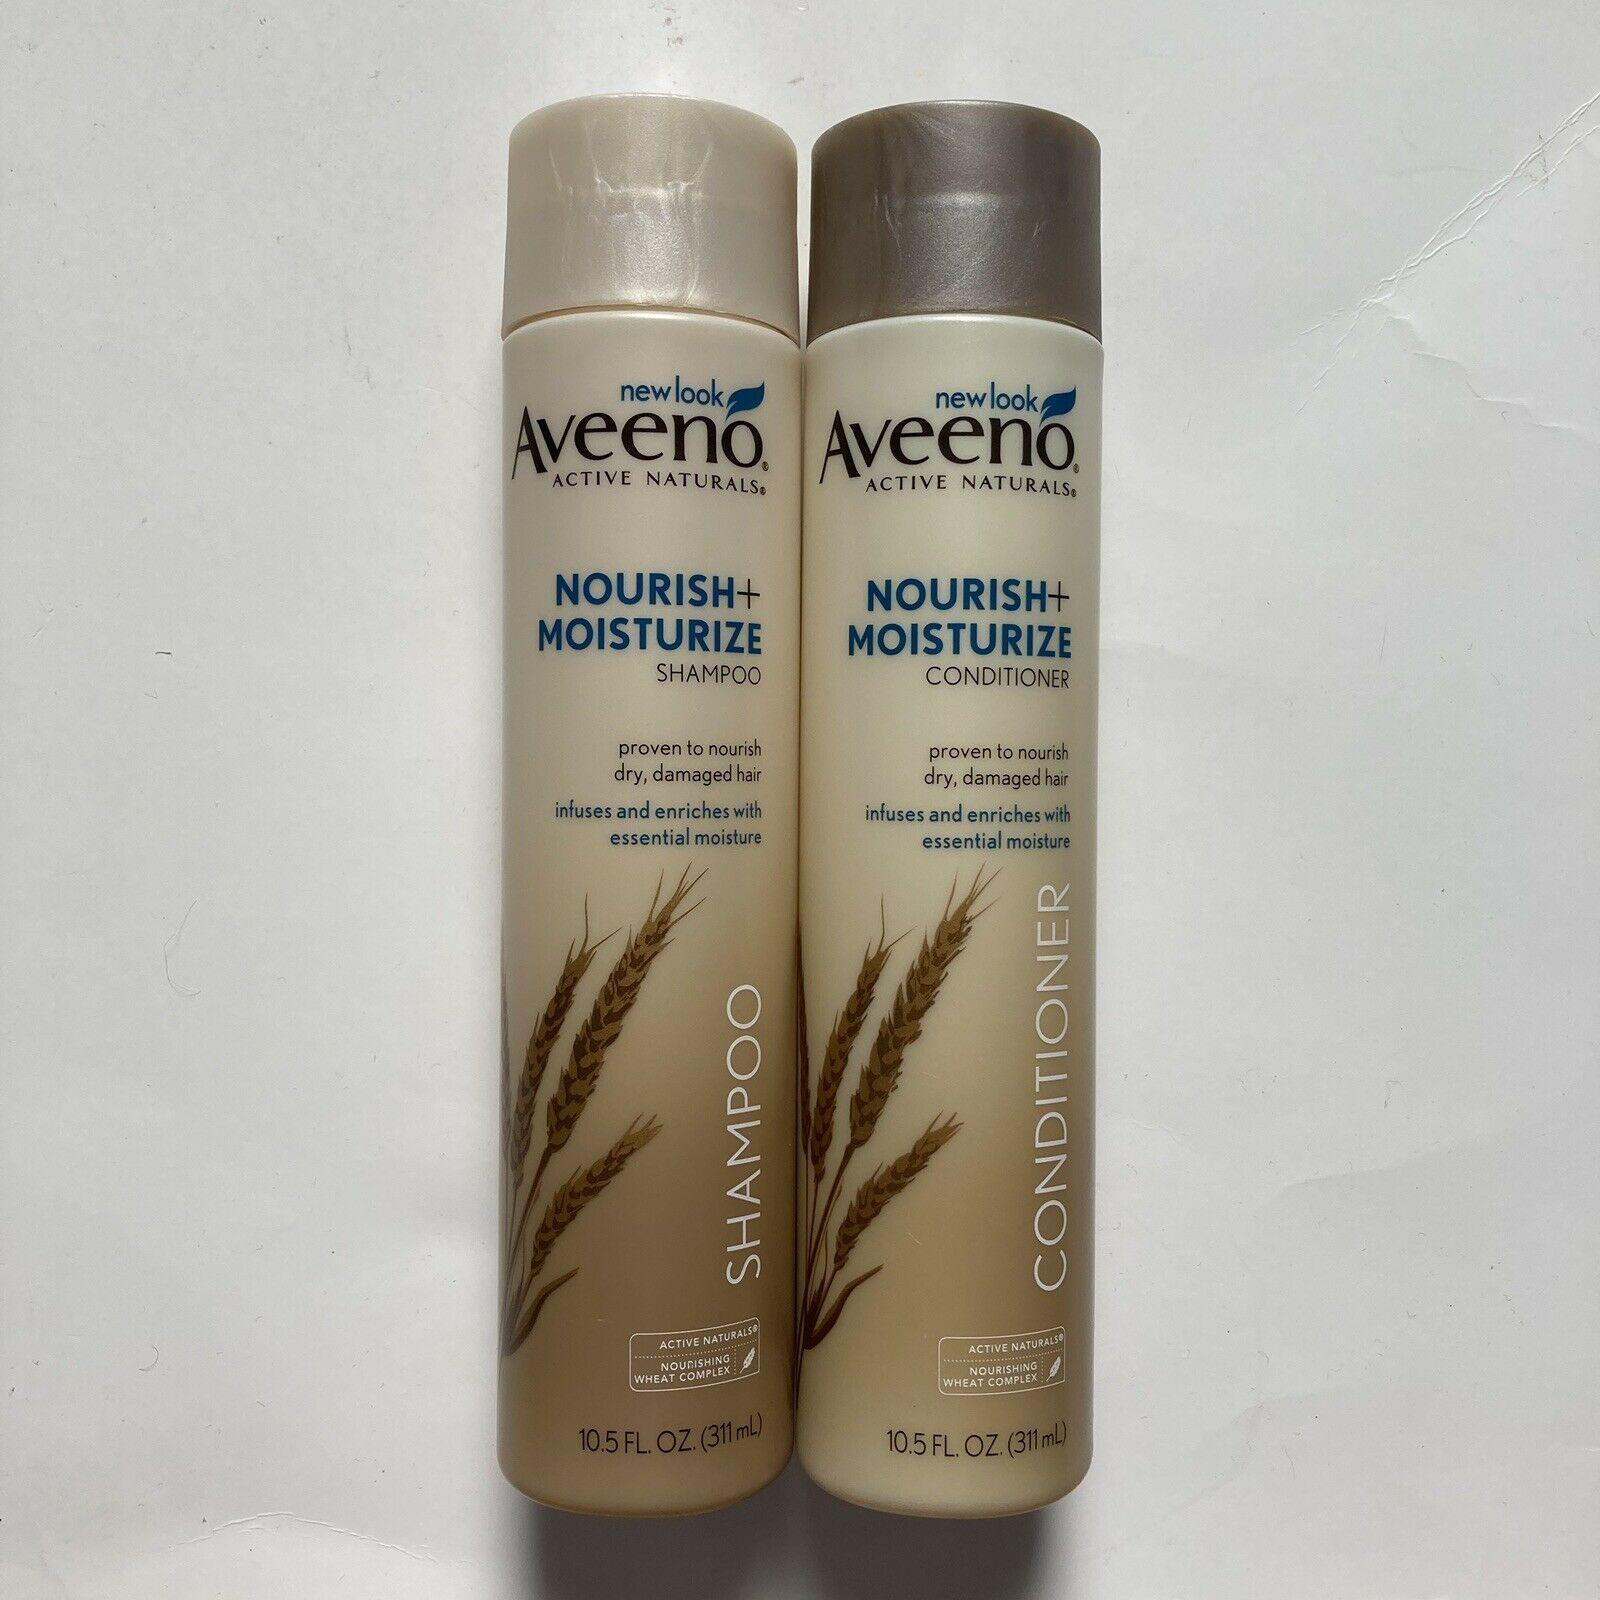 Aveeno Active Naturals Nourish + Moisturize Shampoo & Conditioner Set - $42.74